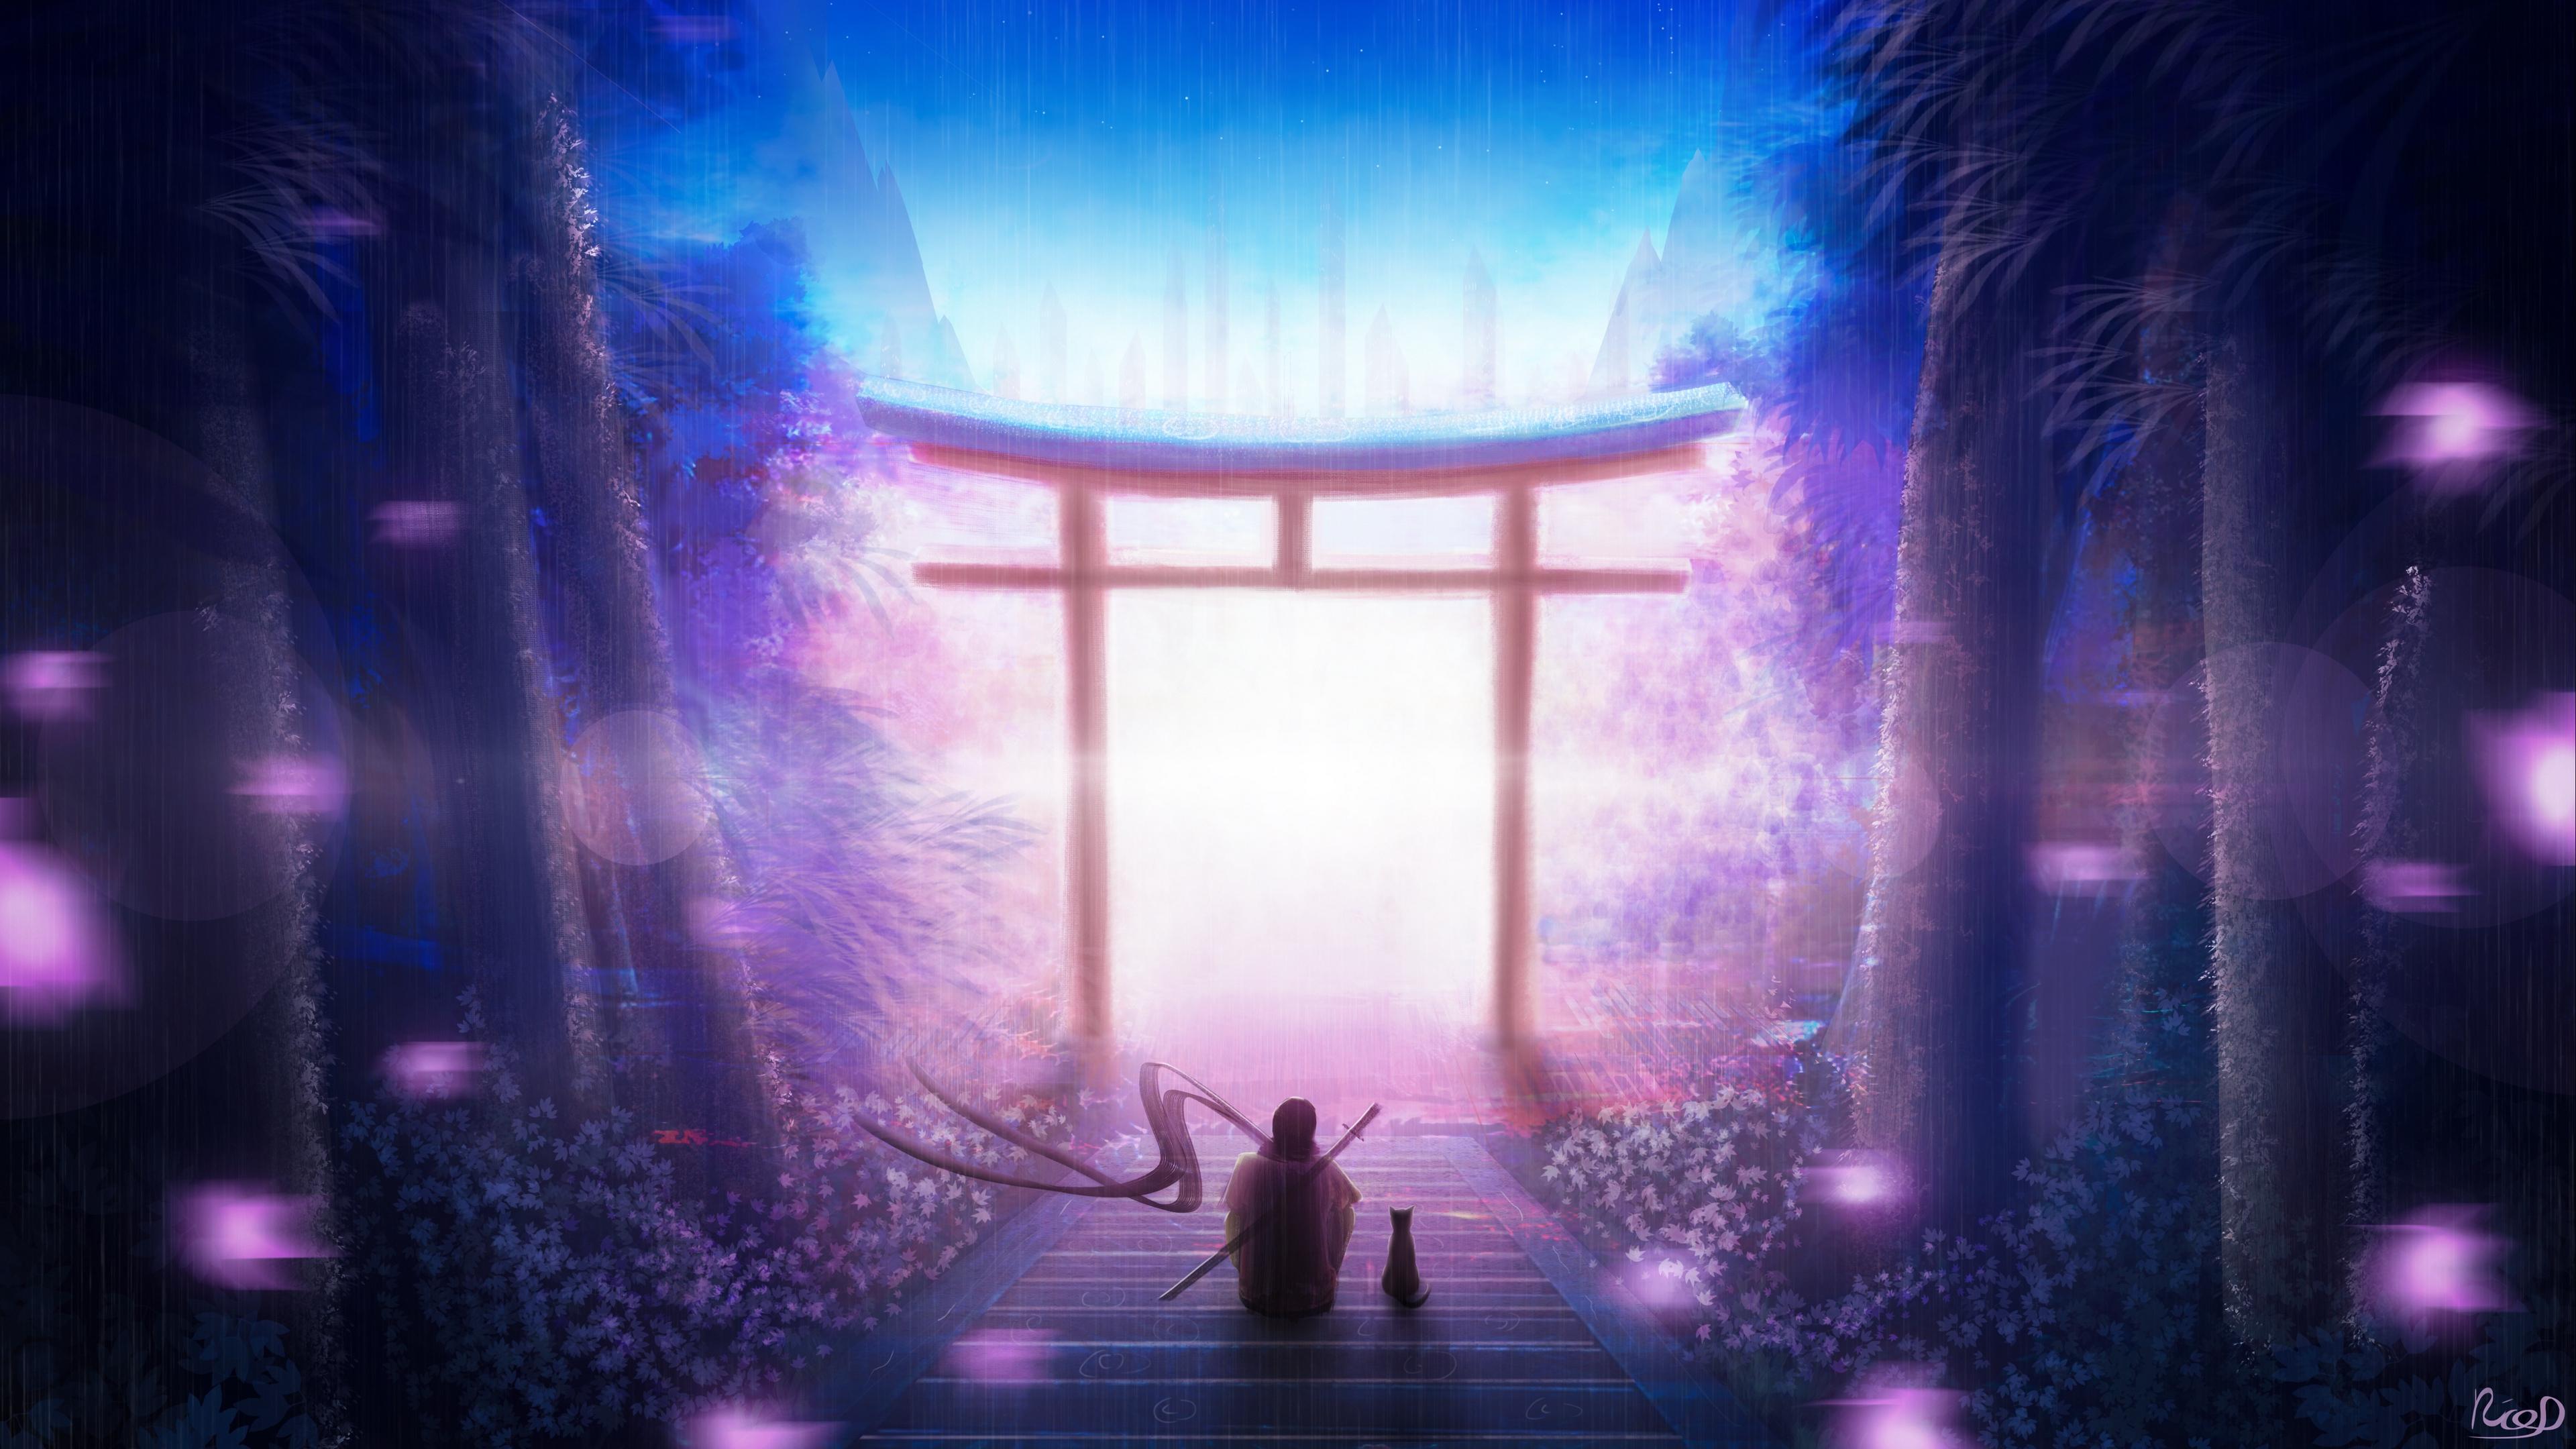 torii art solitude night warrior 4k 1541971541 - torii, art, solitude, night, warrior 4k - torii, solitude, art